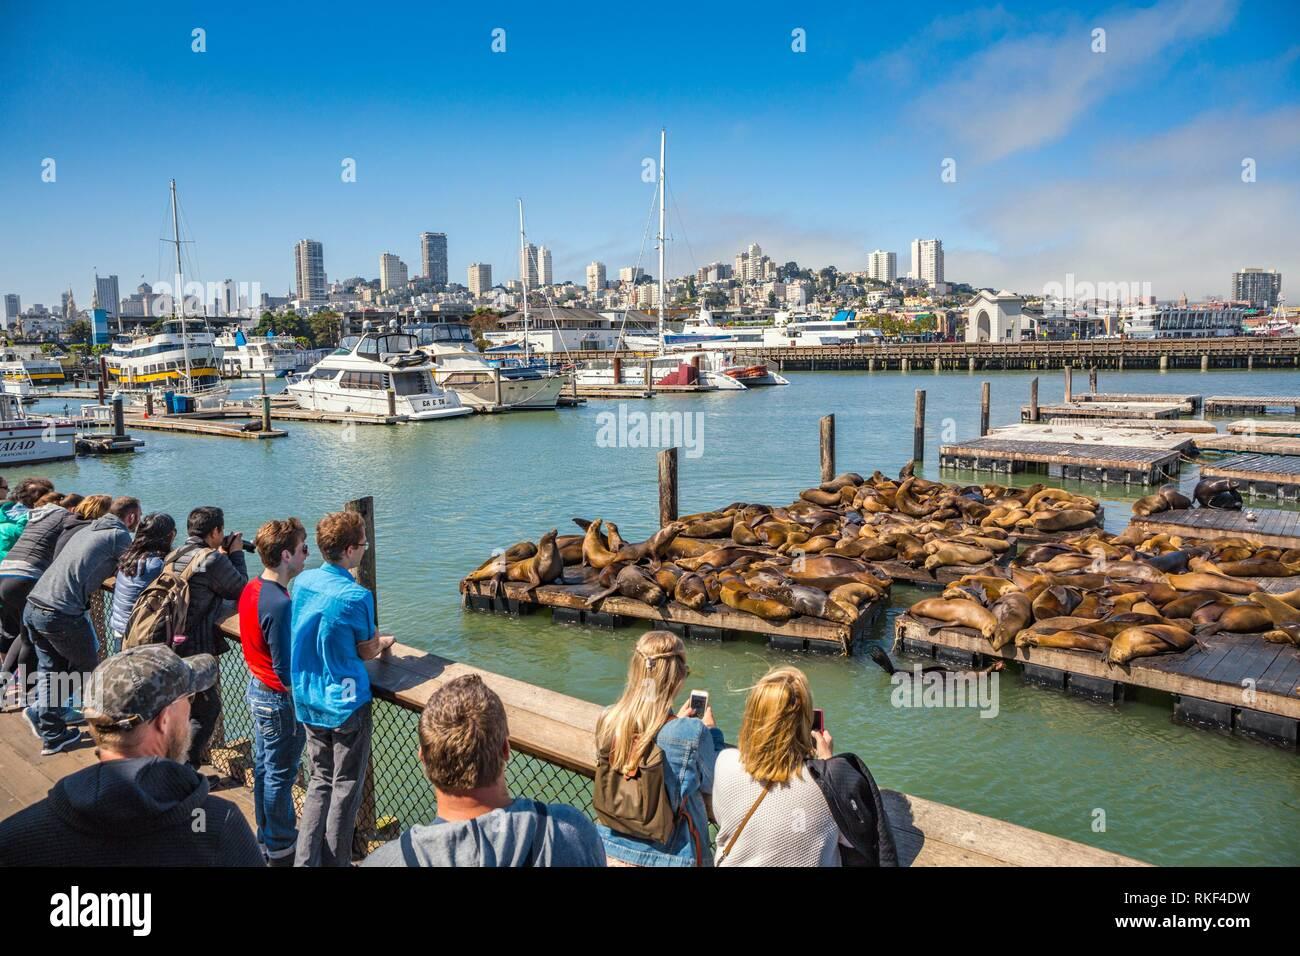 Sea lion colony sunbathing. Pier 39. Fisherman Wharf neighborhood. San Francisco. California, USA - Stock Image